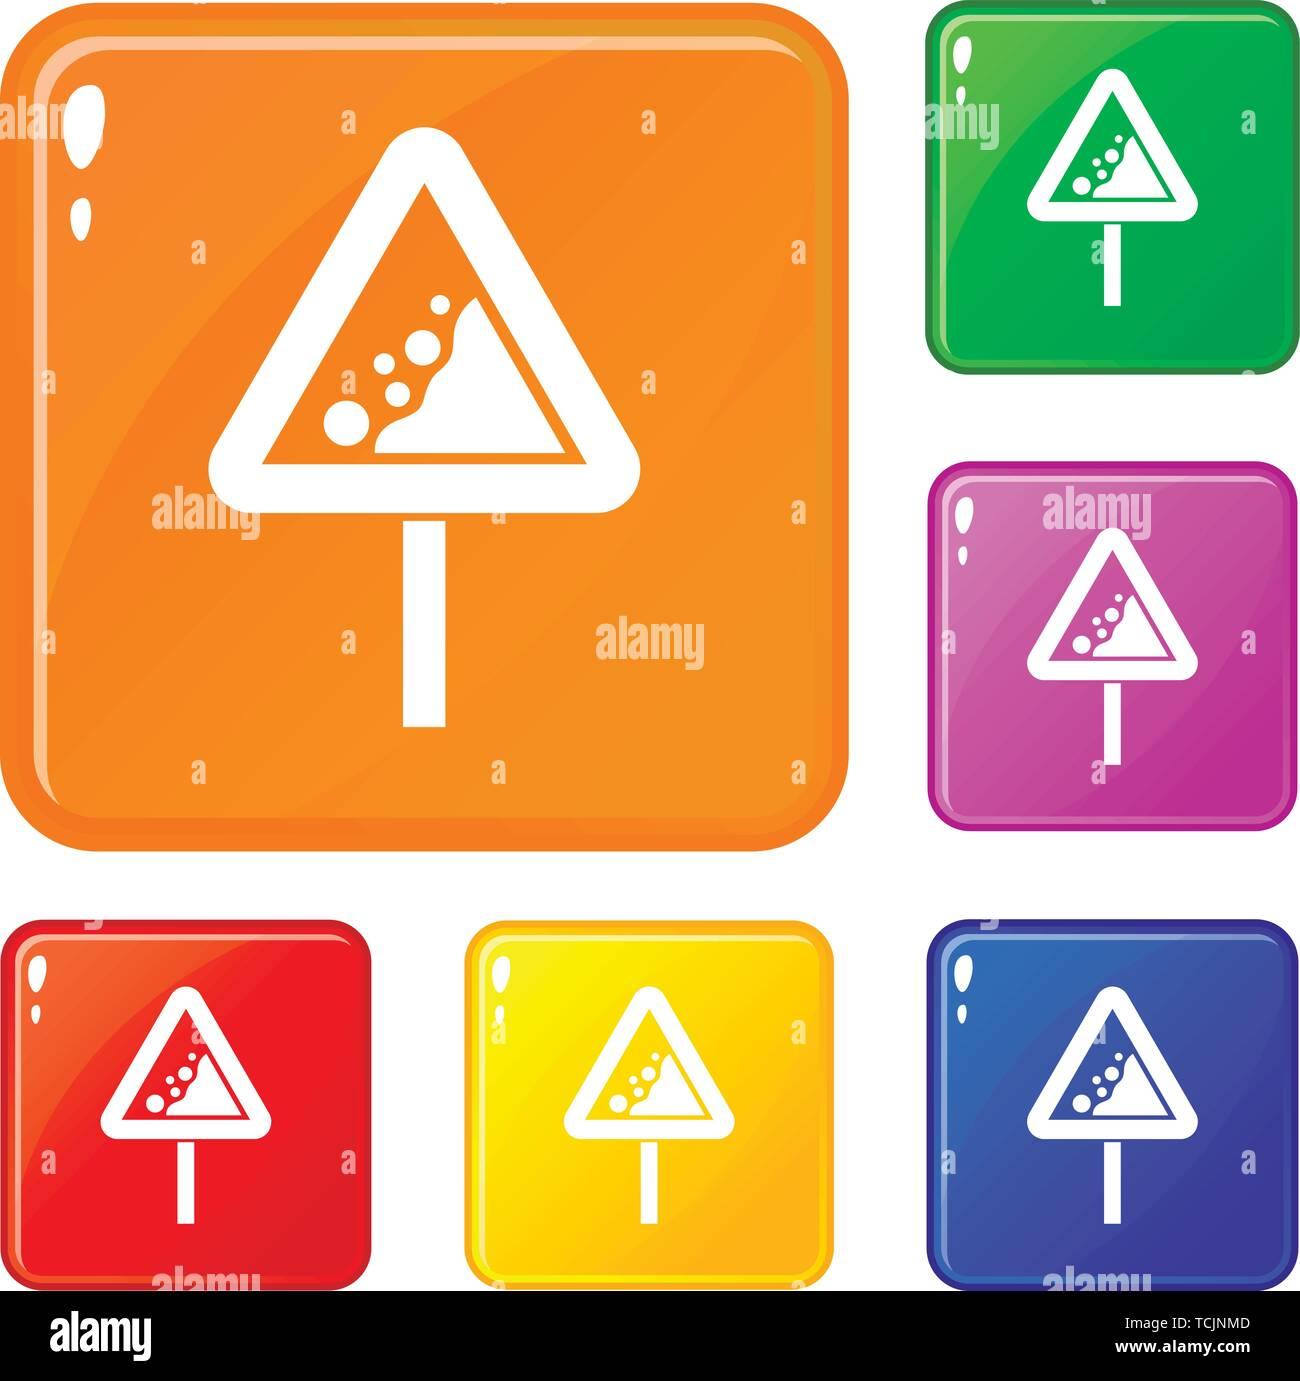 Falling rocks warning traffic sign icons set vector color - Stock Image